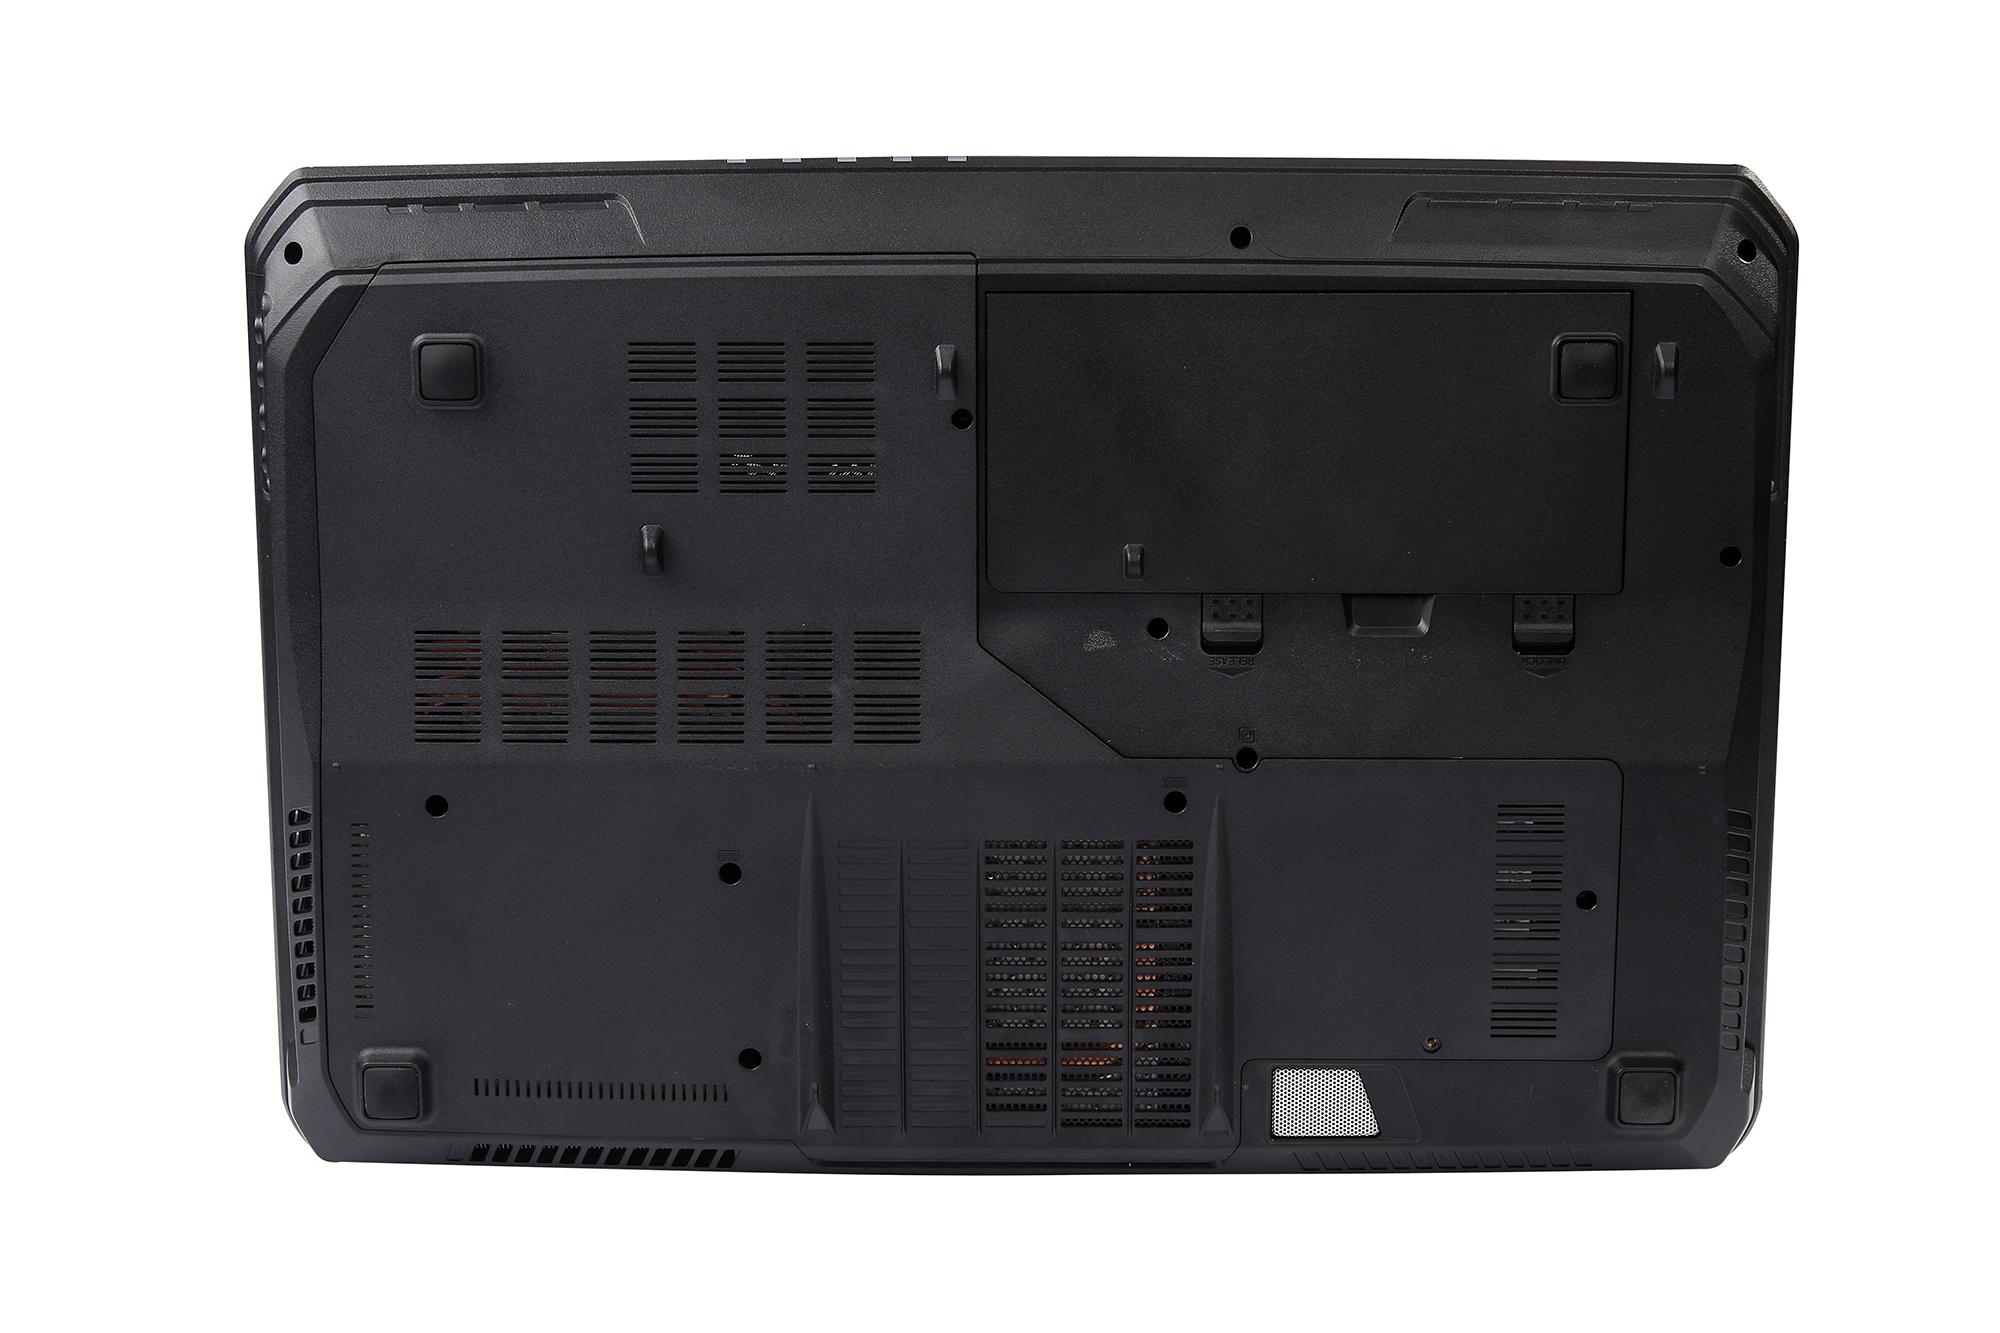 MONSTER® TULPAR T7 V2.5 17.3